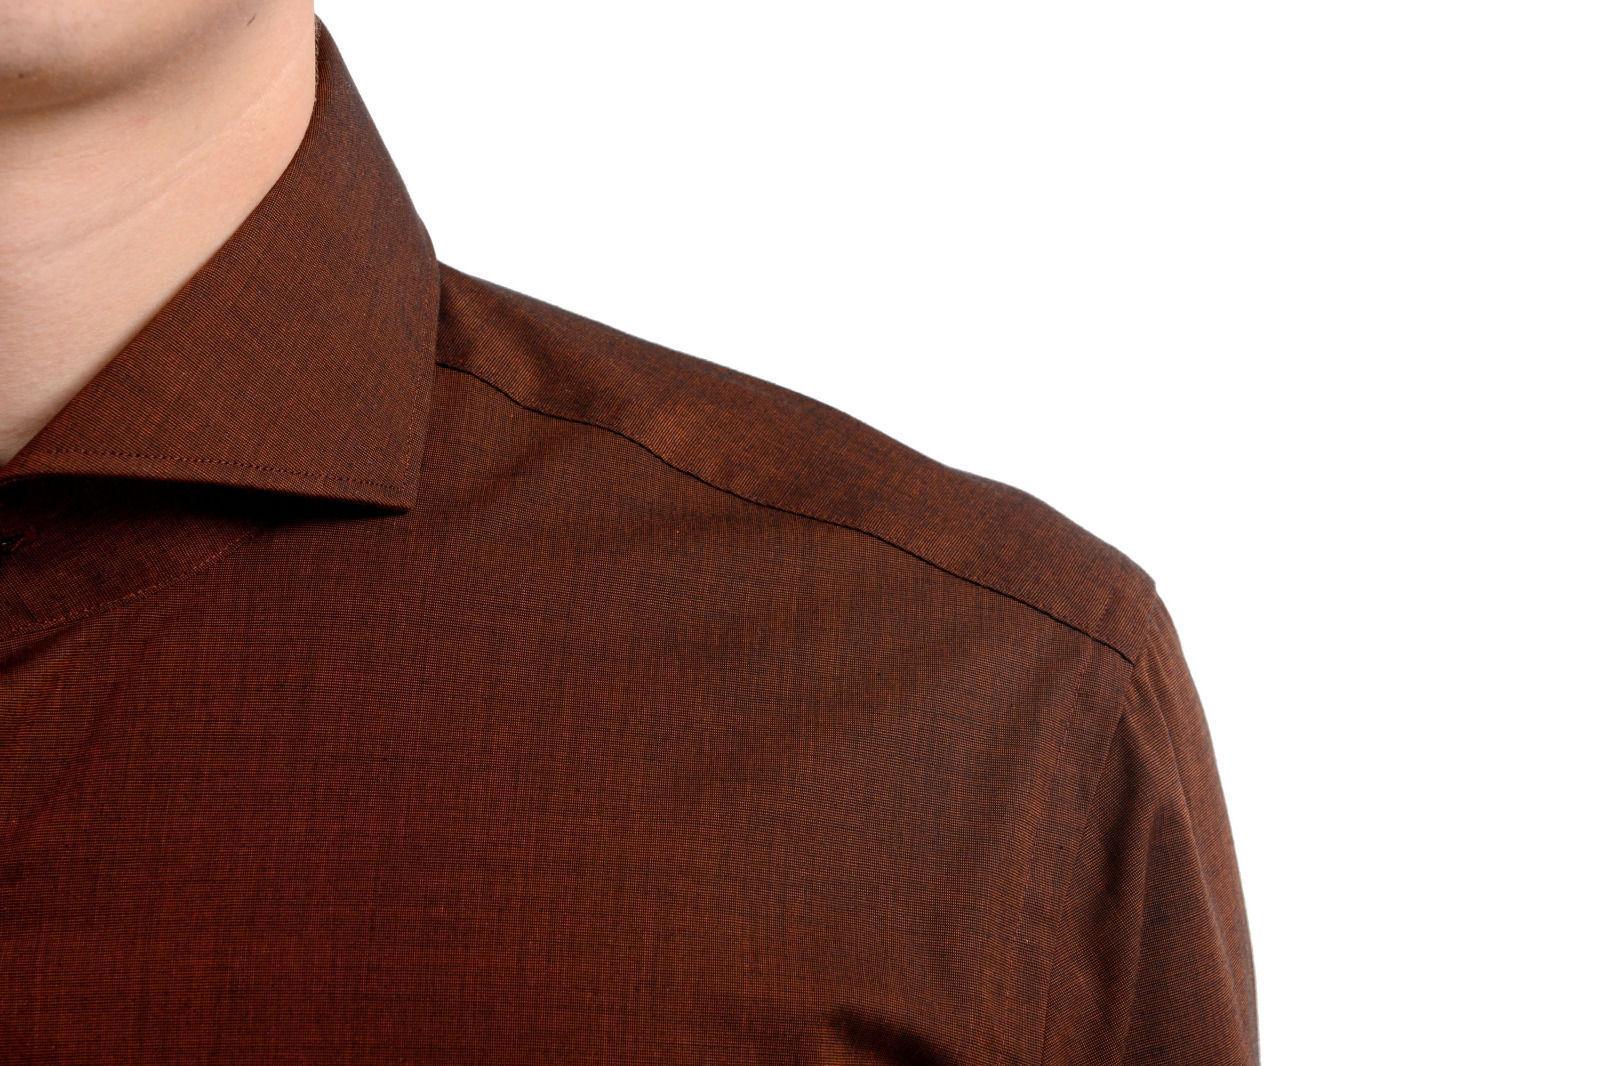 5d9afa1d Hugo Boss Slim Fit C-Dwayne Men's Brown Long Sleeve Dress Shirt US 15 3